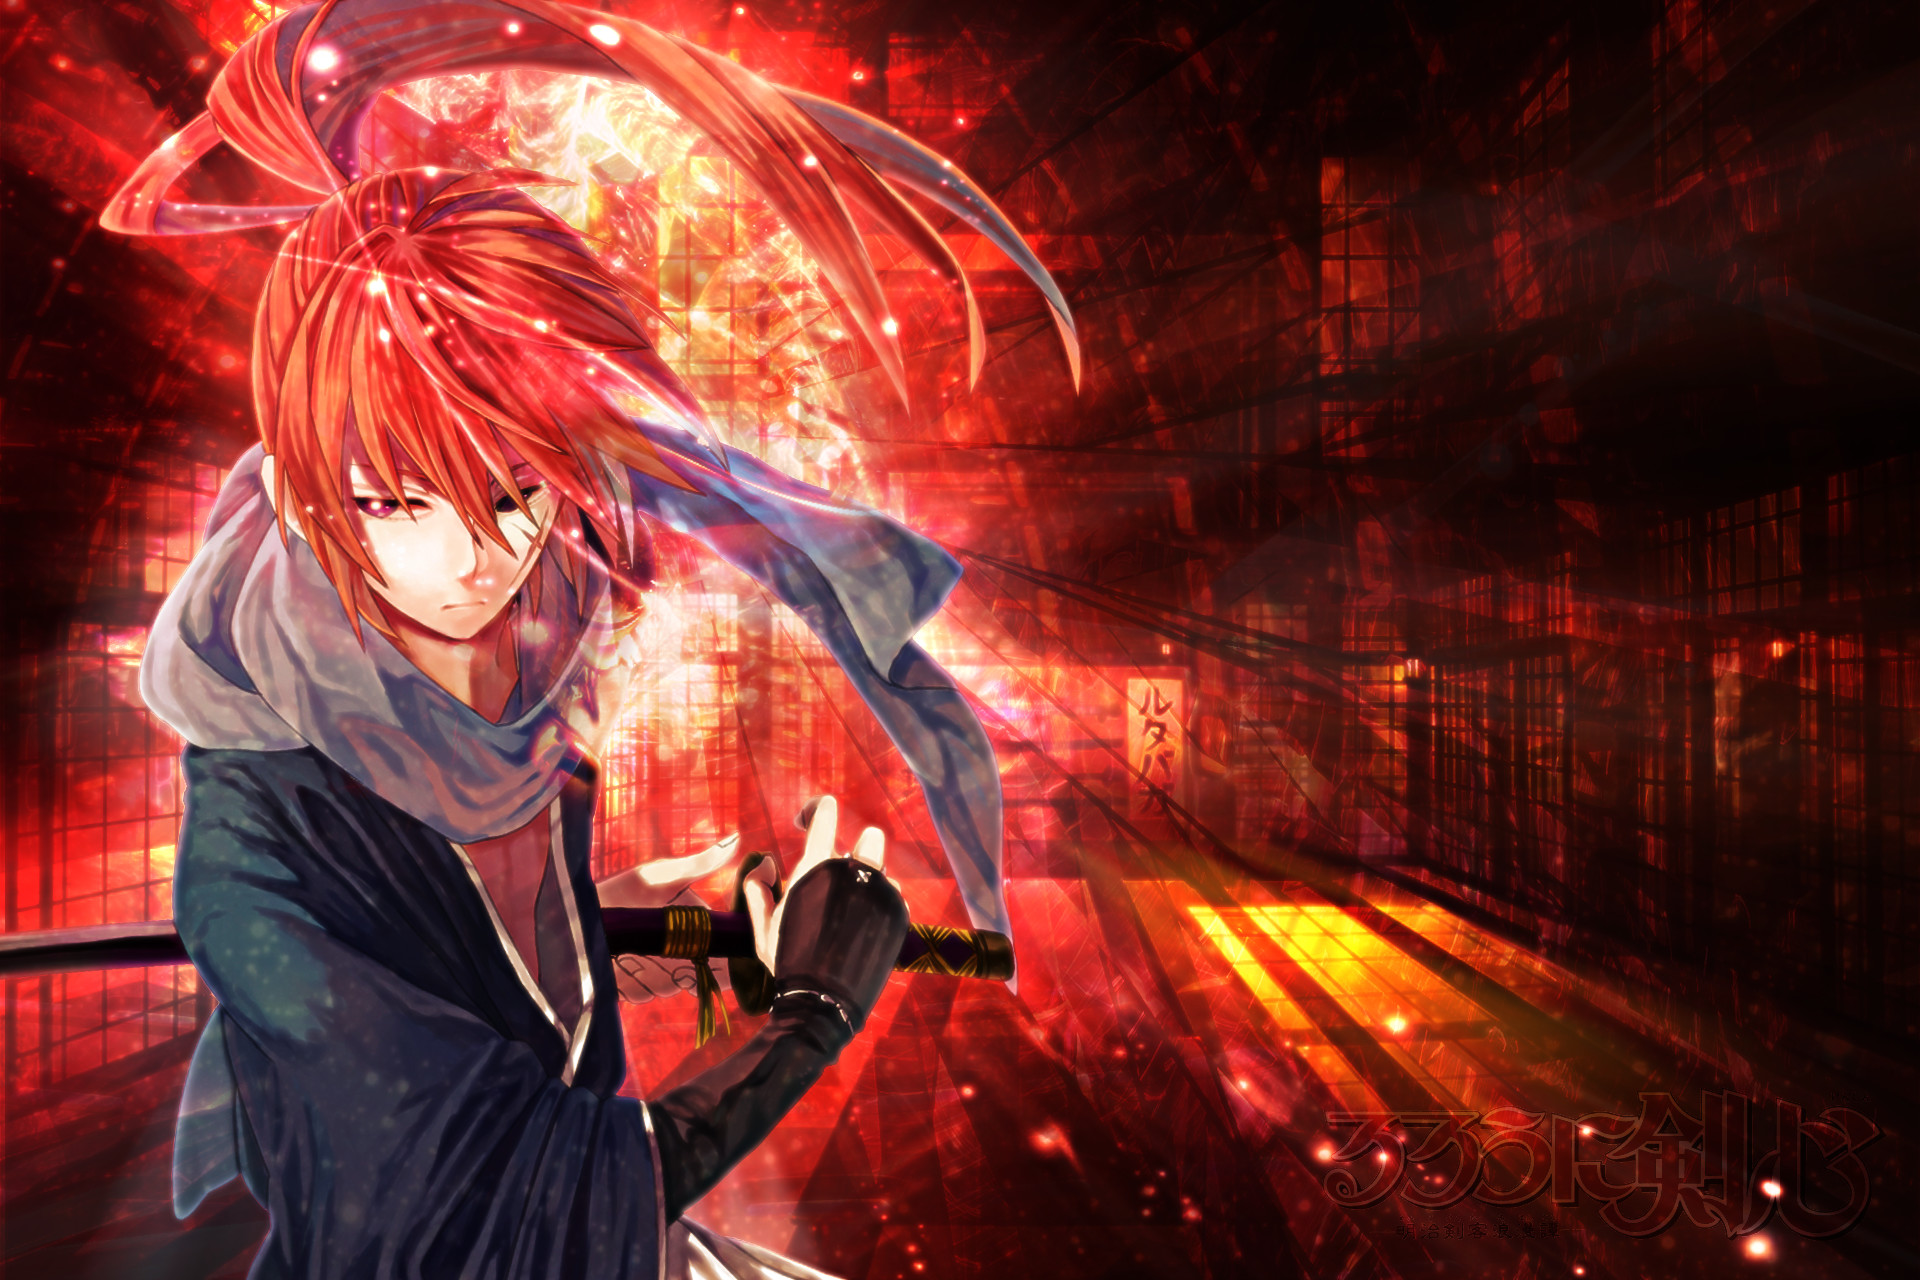 Samurai X Wallpaper Hd 53 Images